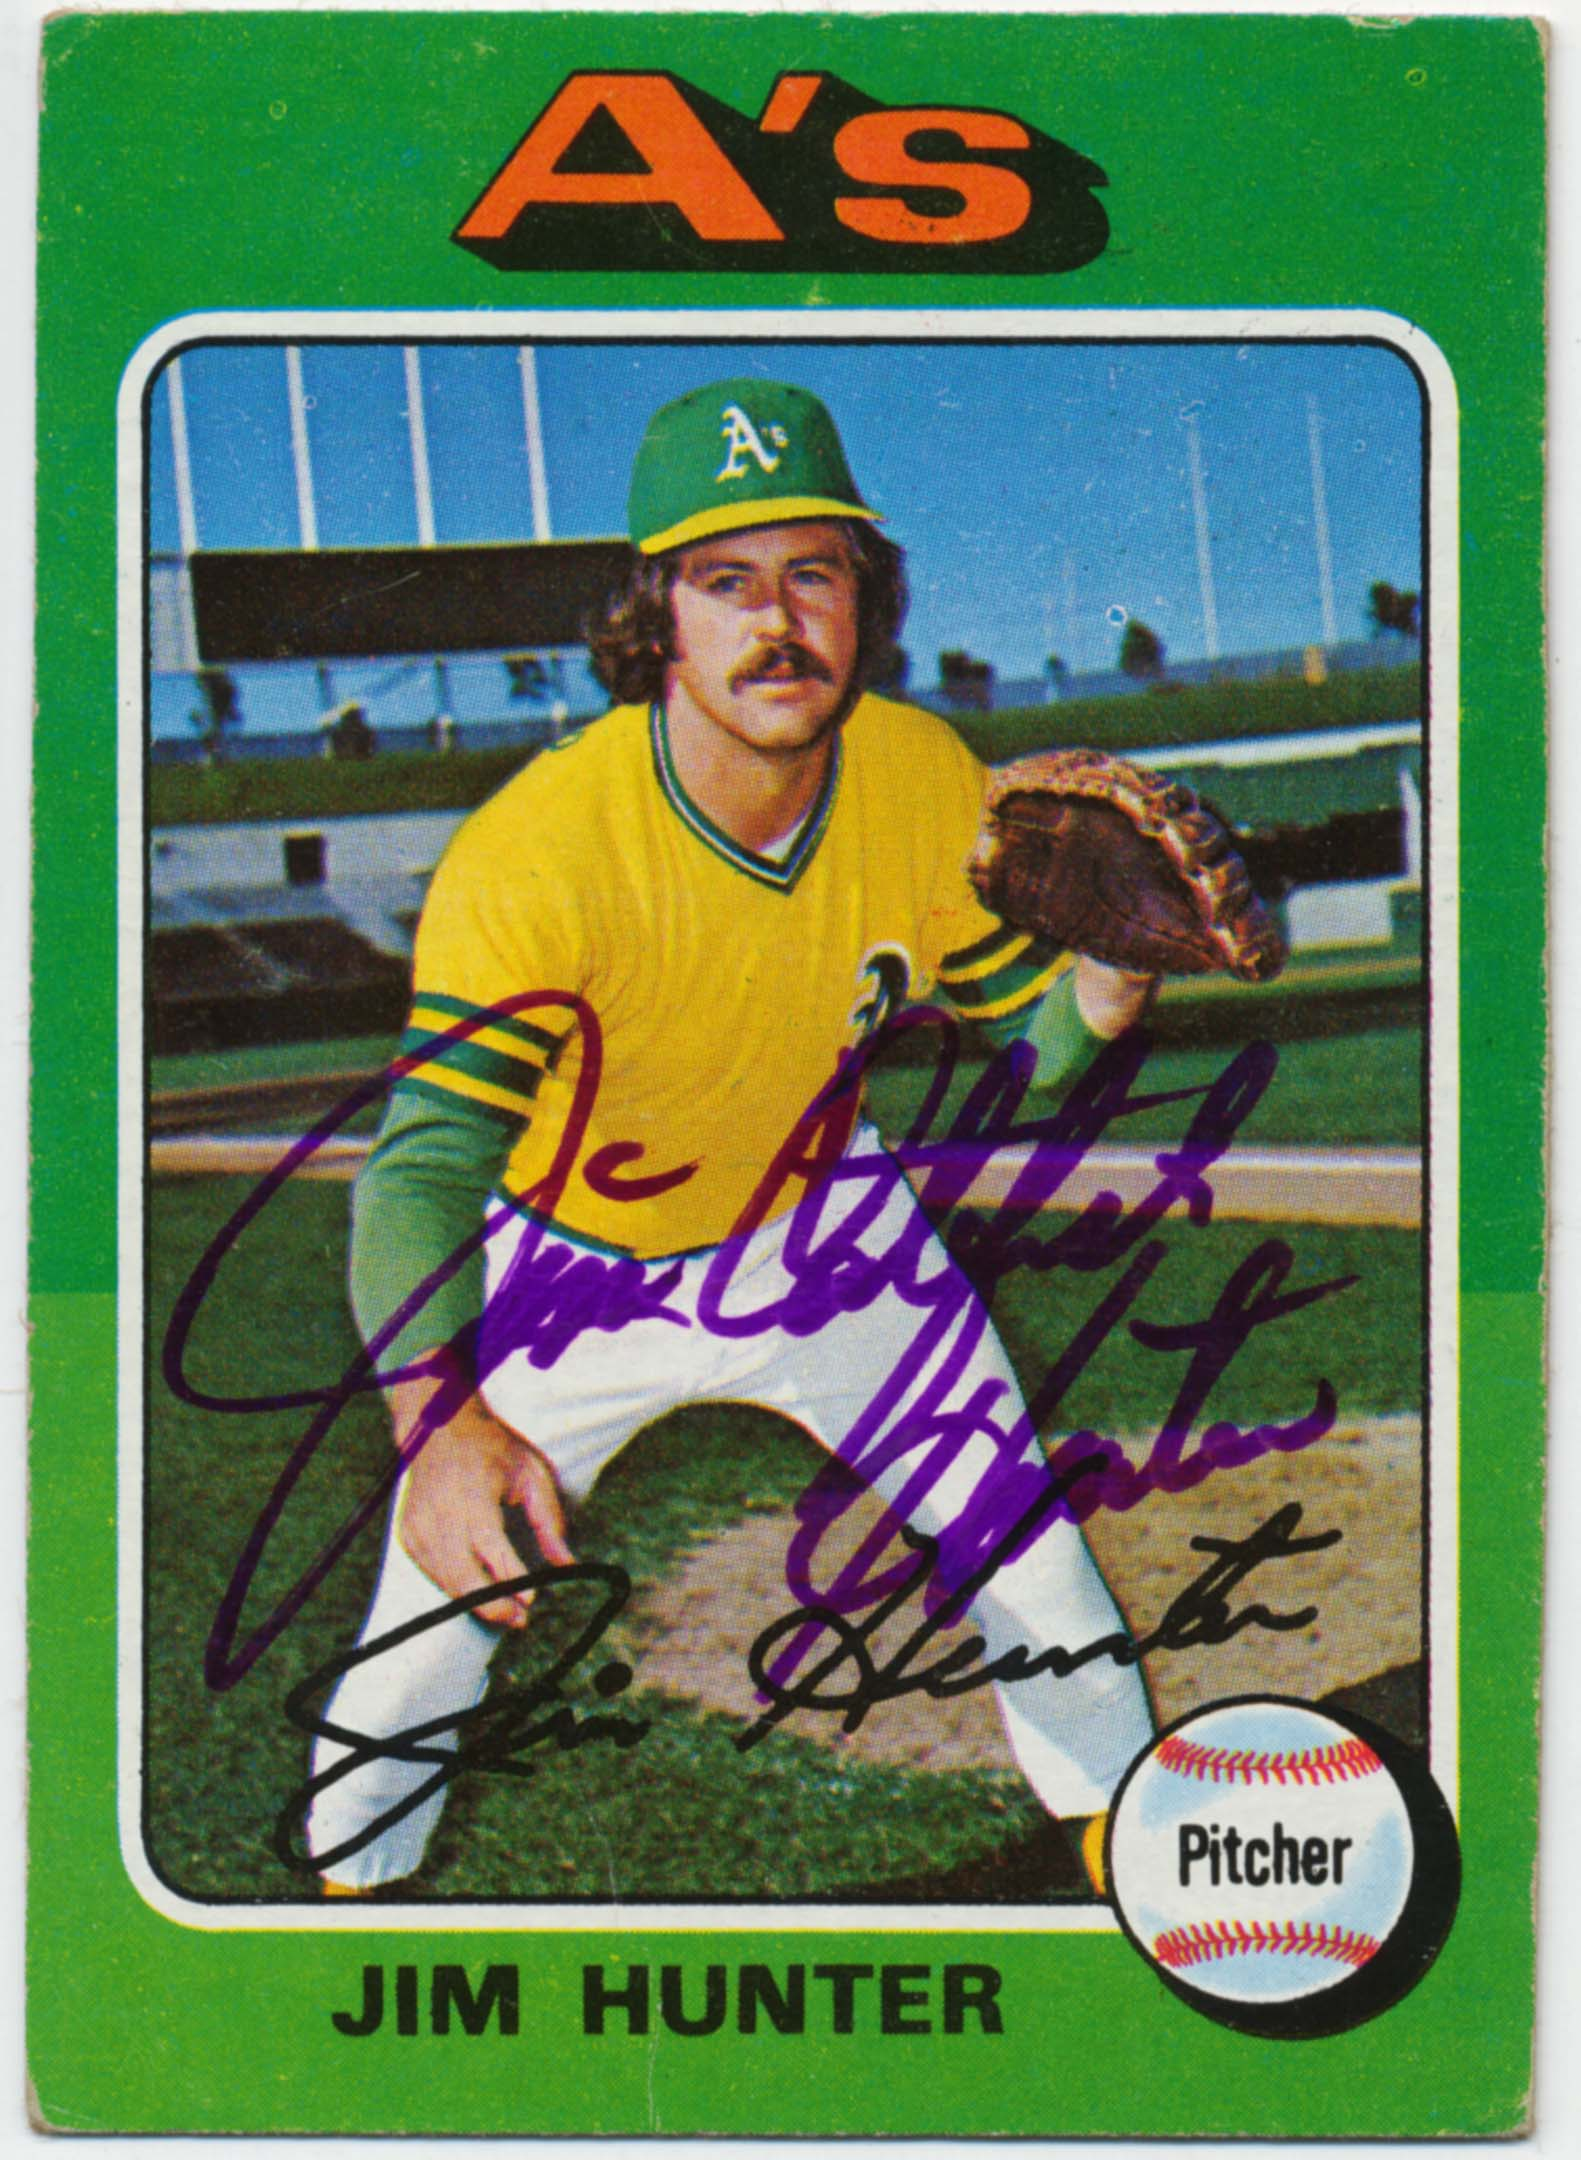 Lot #65 1975 Topps # 230 Jim Hunter Cond: 9.5